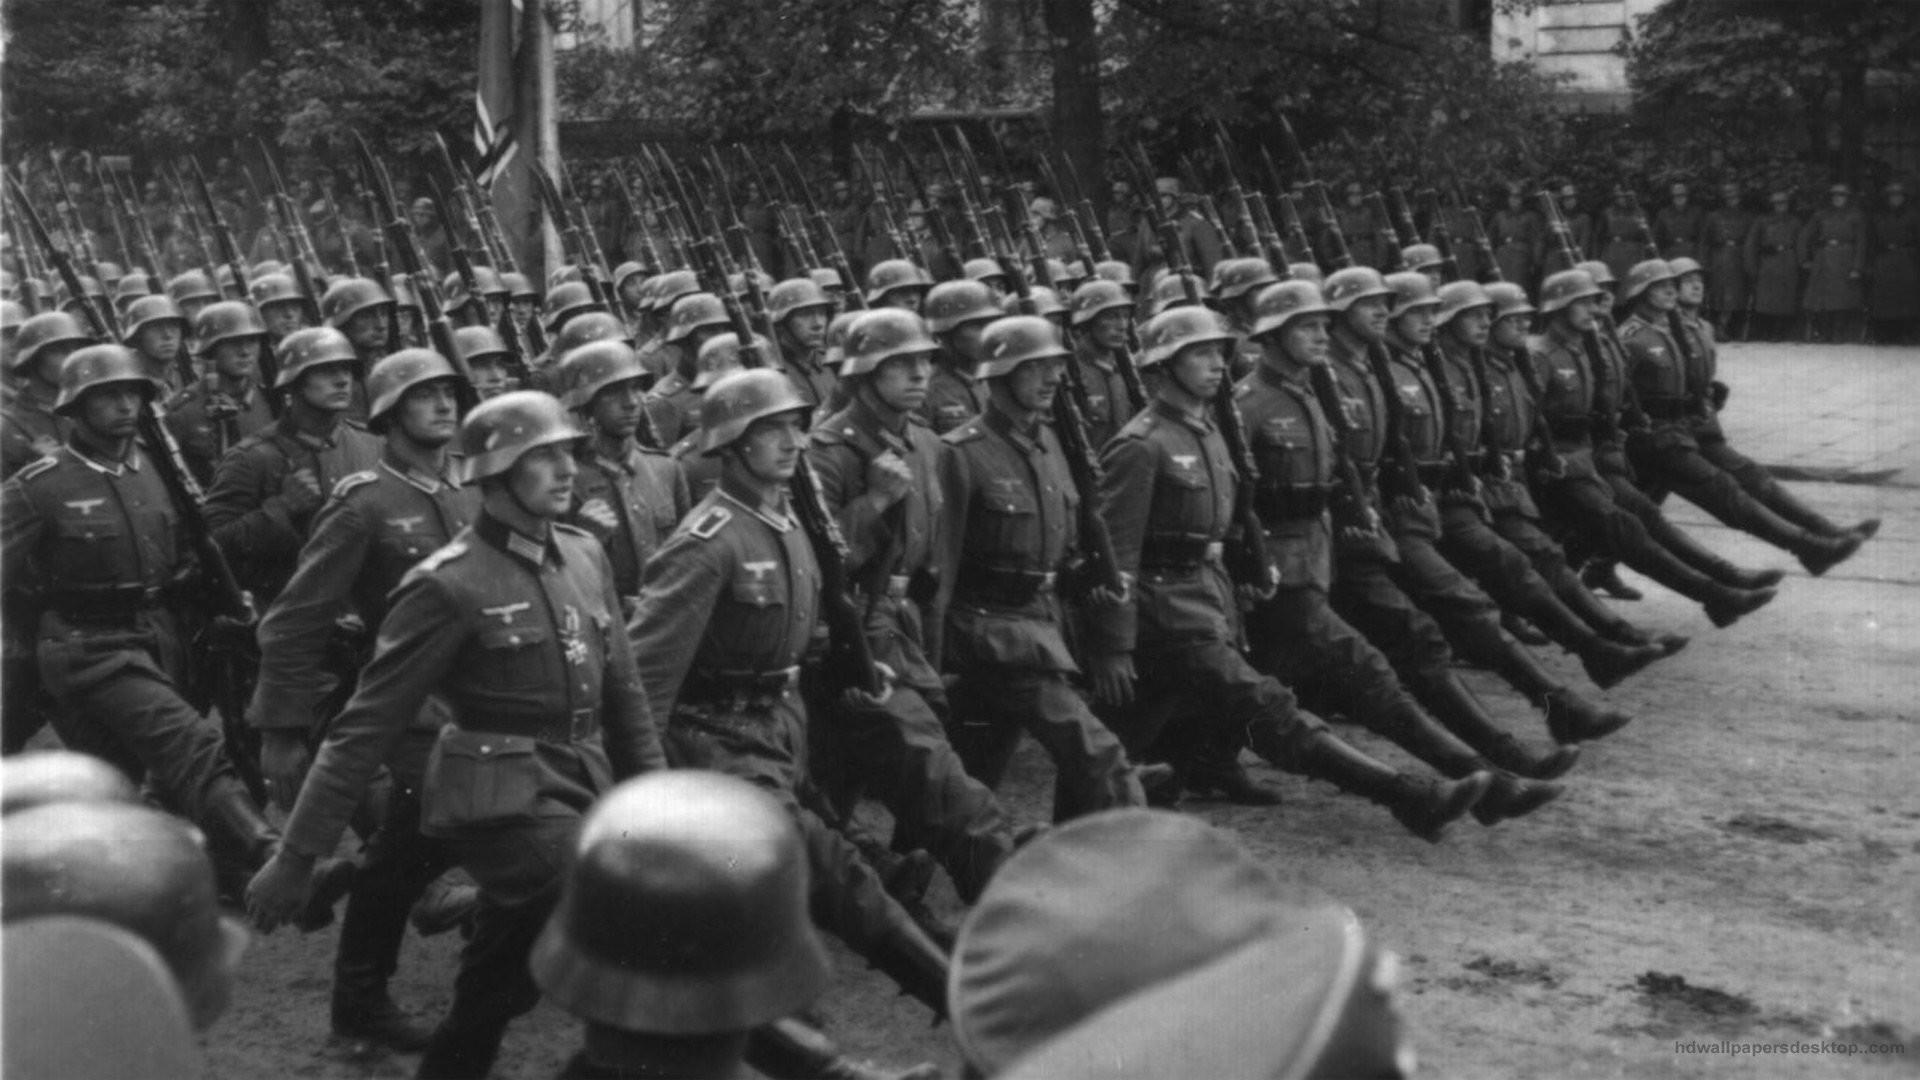 1920x1080 44 World War II HD Wallpapers